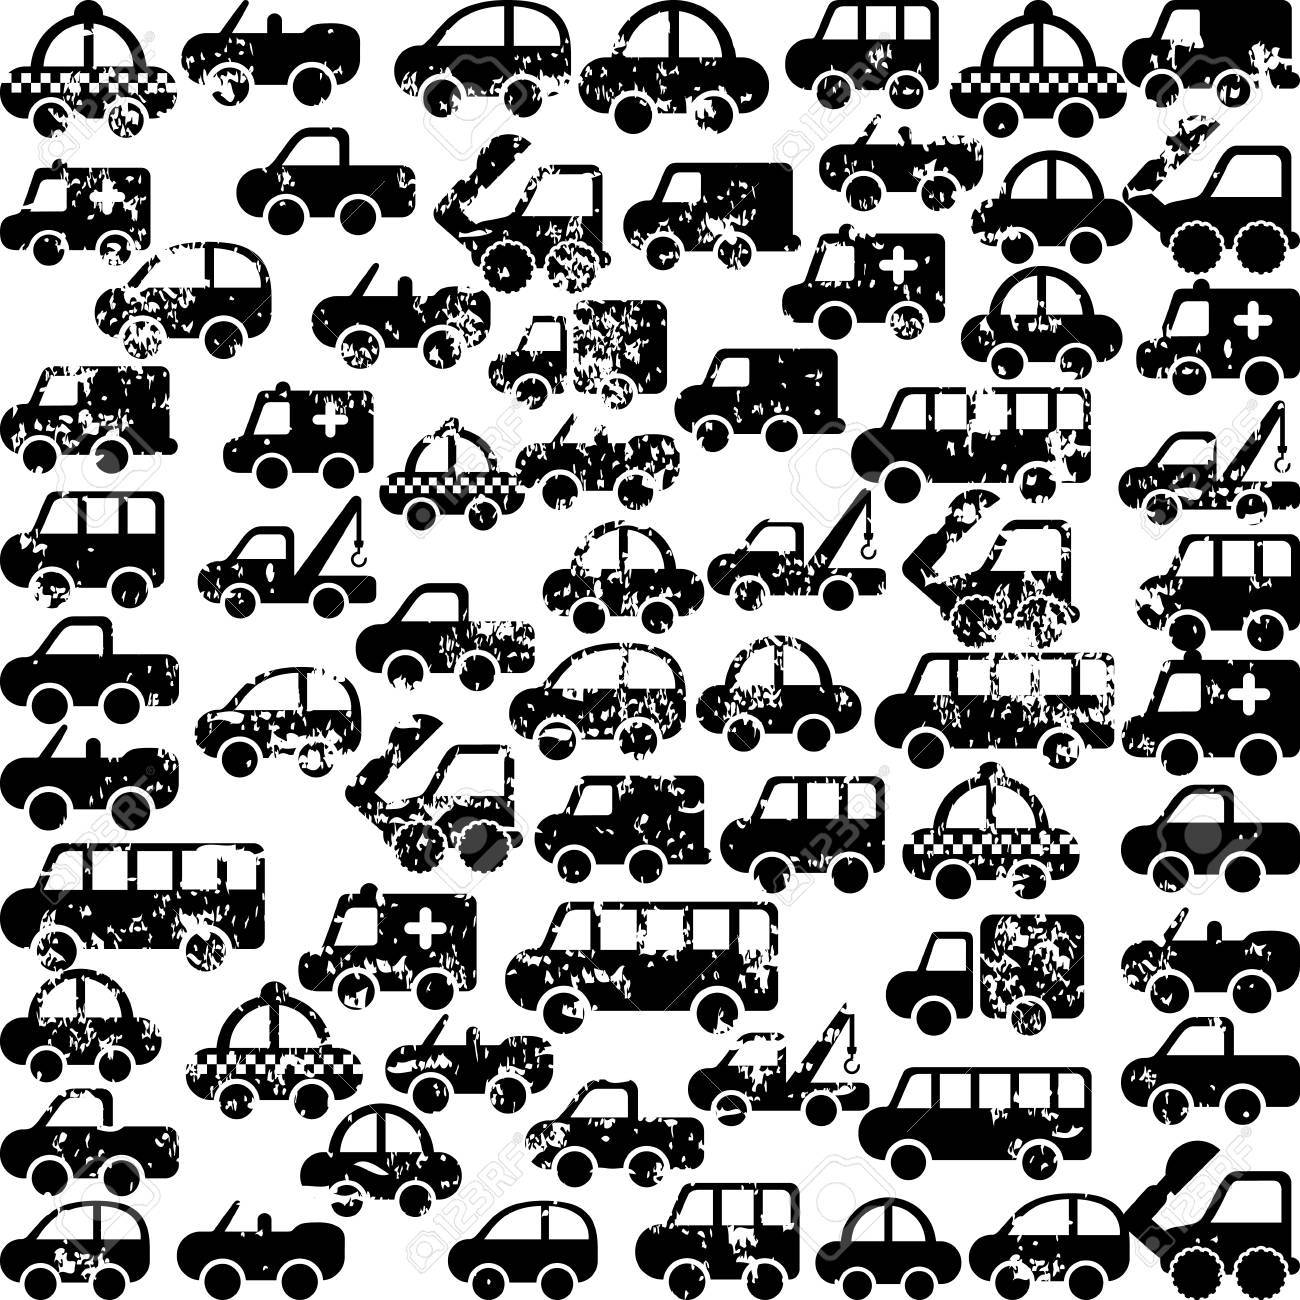 cars design over white background vector illustration Stock Vector - 22311029